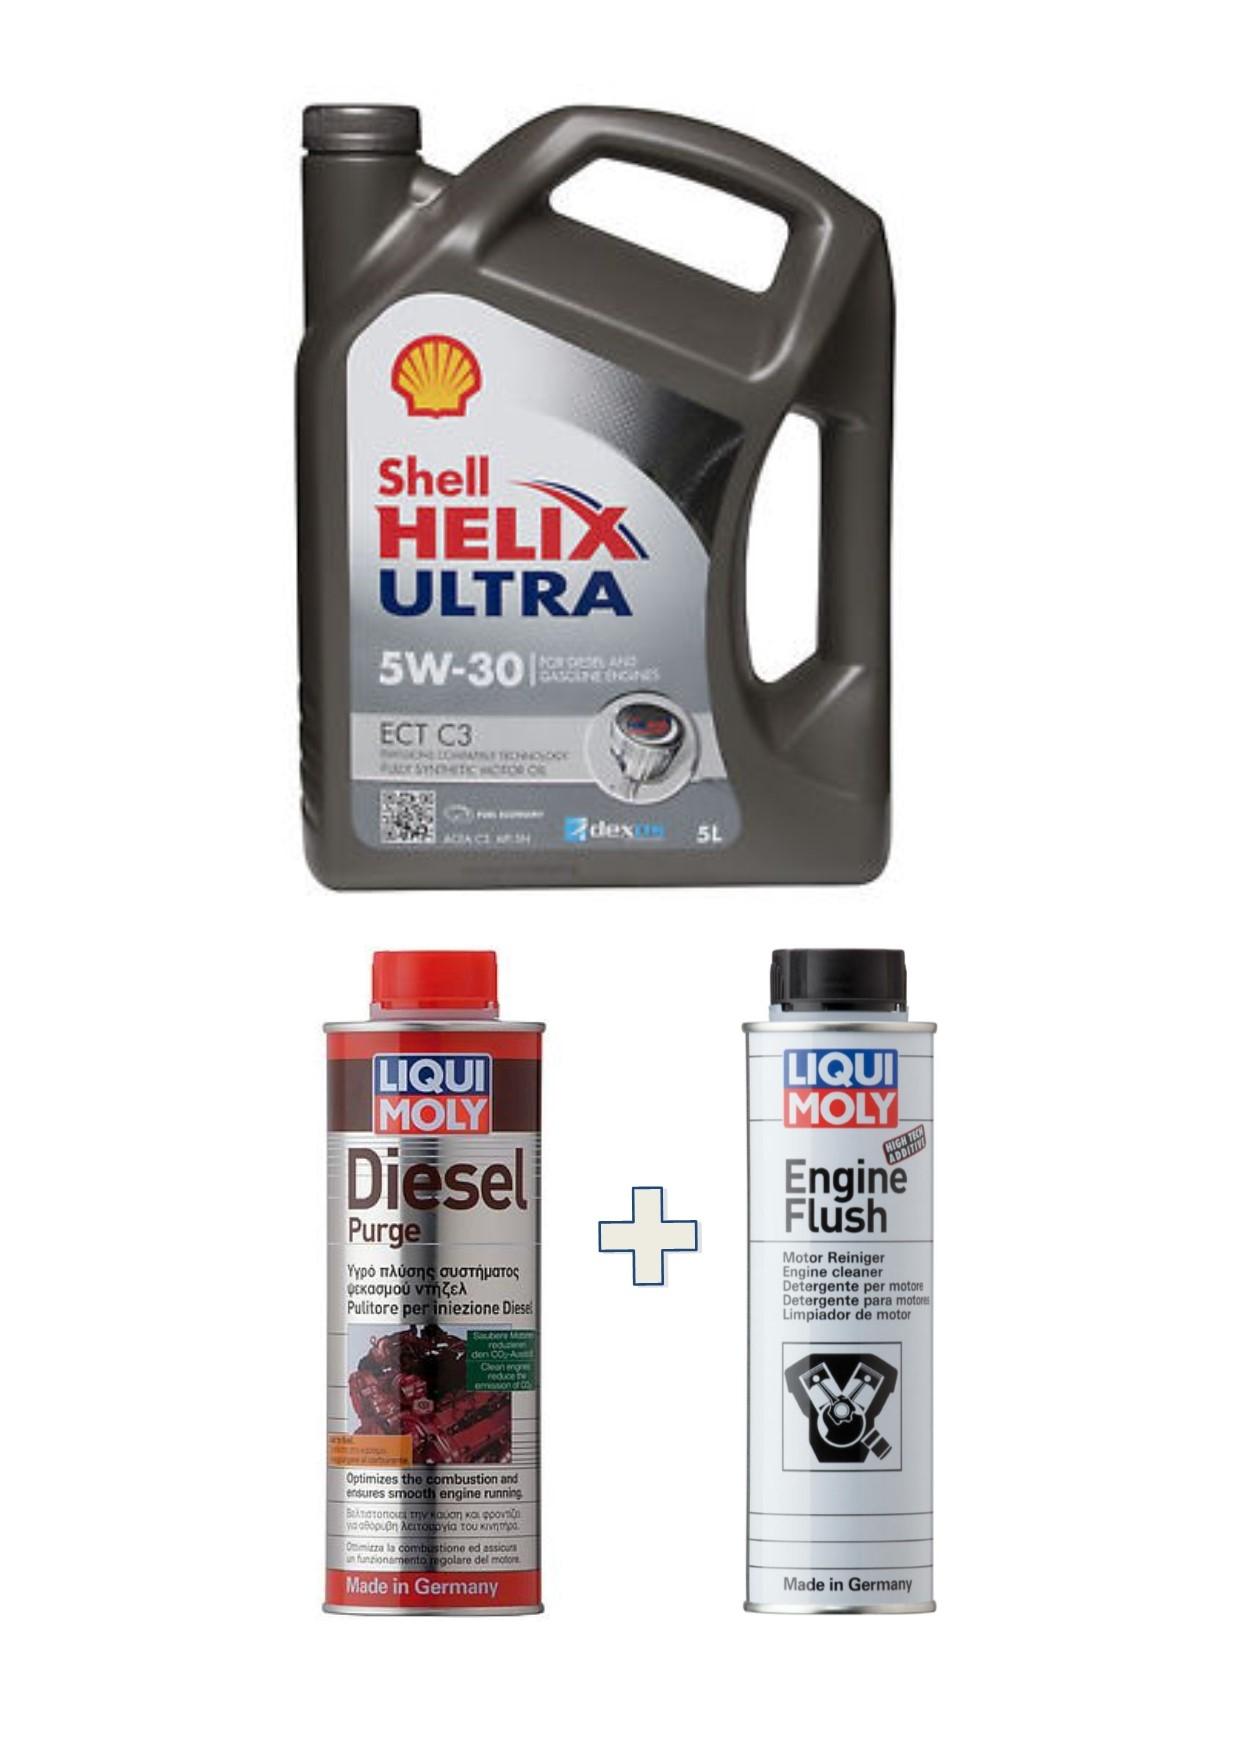 KIT Shell Helix Ultra ECT C3 5W30 bar 5 Litri + Liquimoly Diesel Purge +Engine Flush